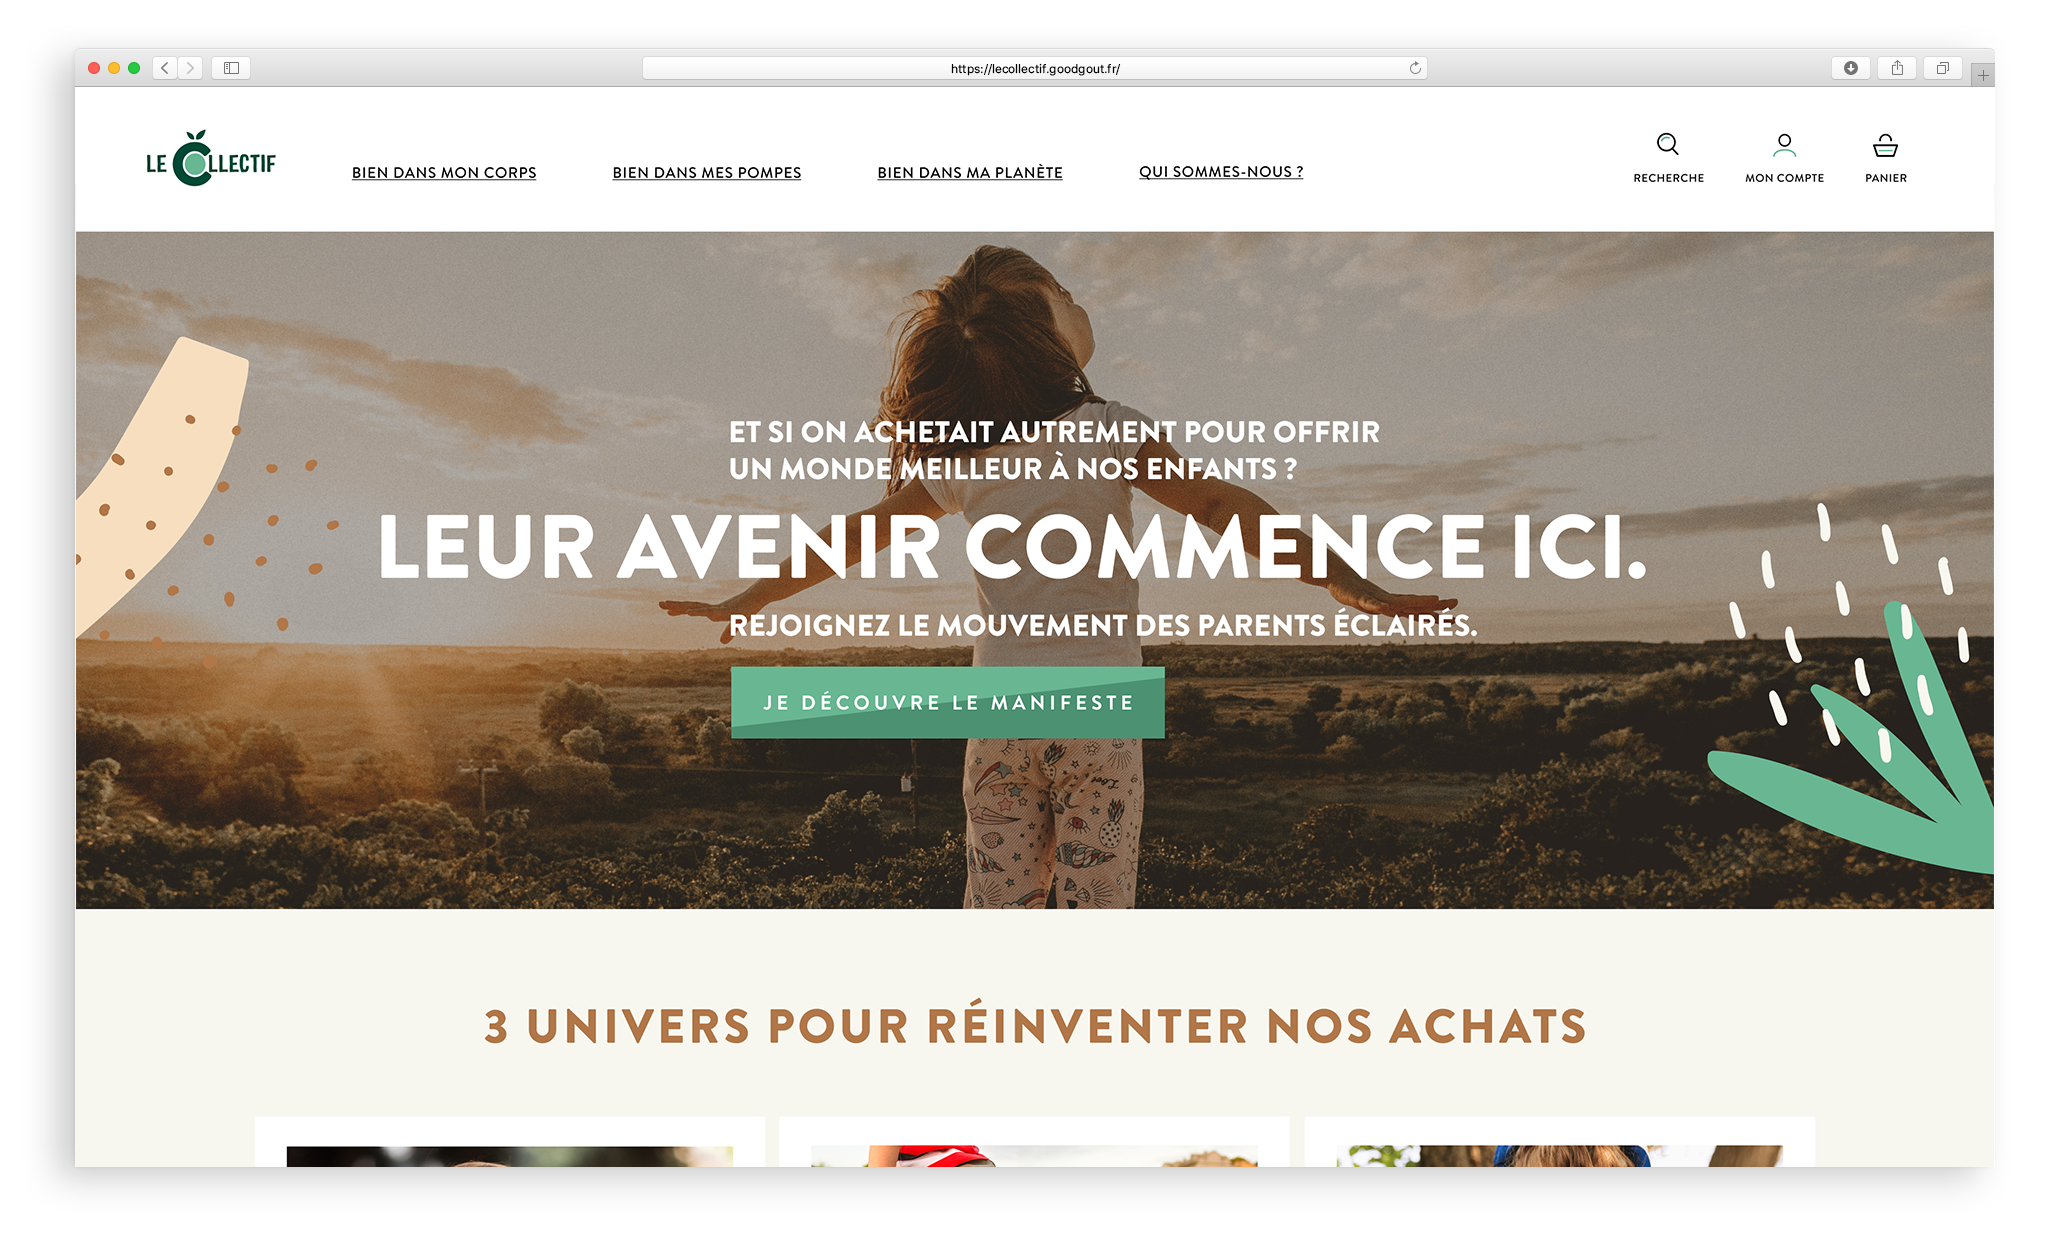 Mockup-Website-GG-01